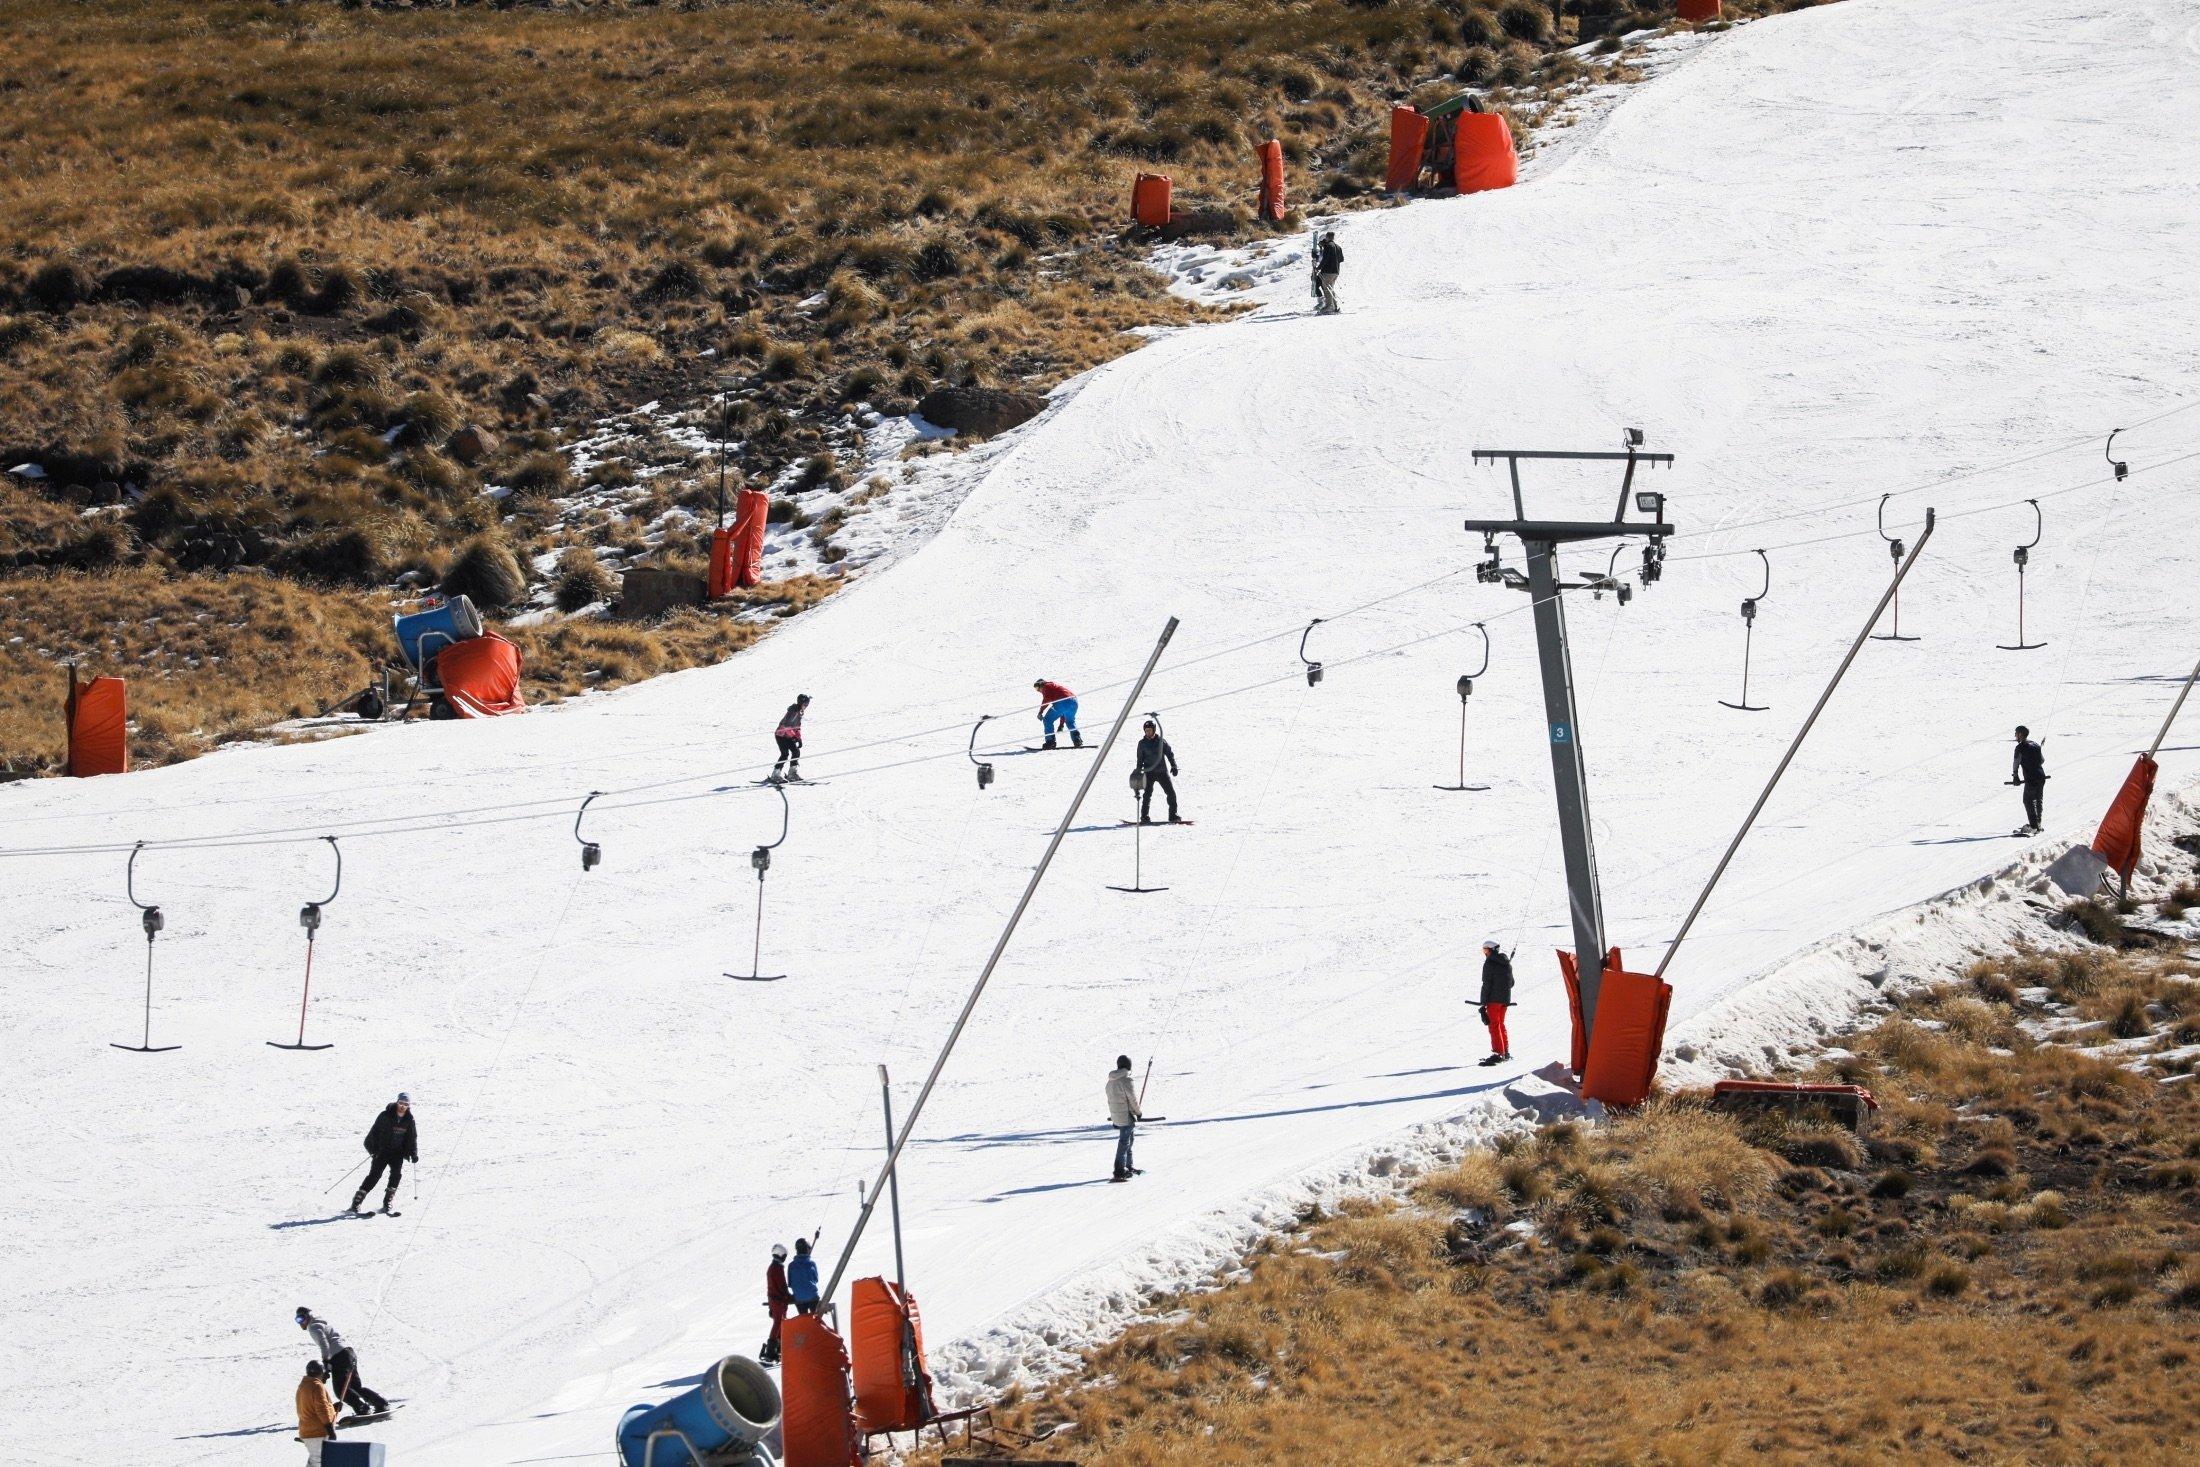 People ski at Kapoko Snow Park at Afriski Mountain Resort in Butha Buthe, Lesotho, July 31, 2021. (Reuters Photo)